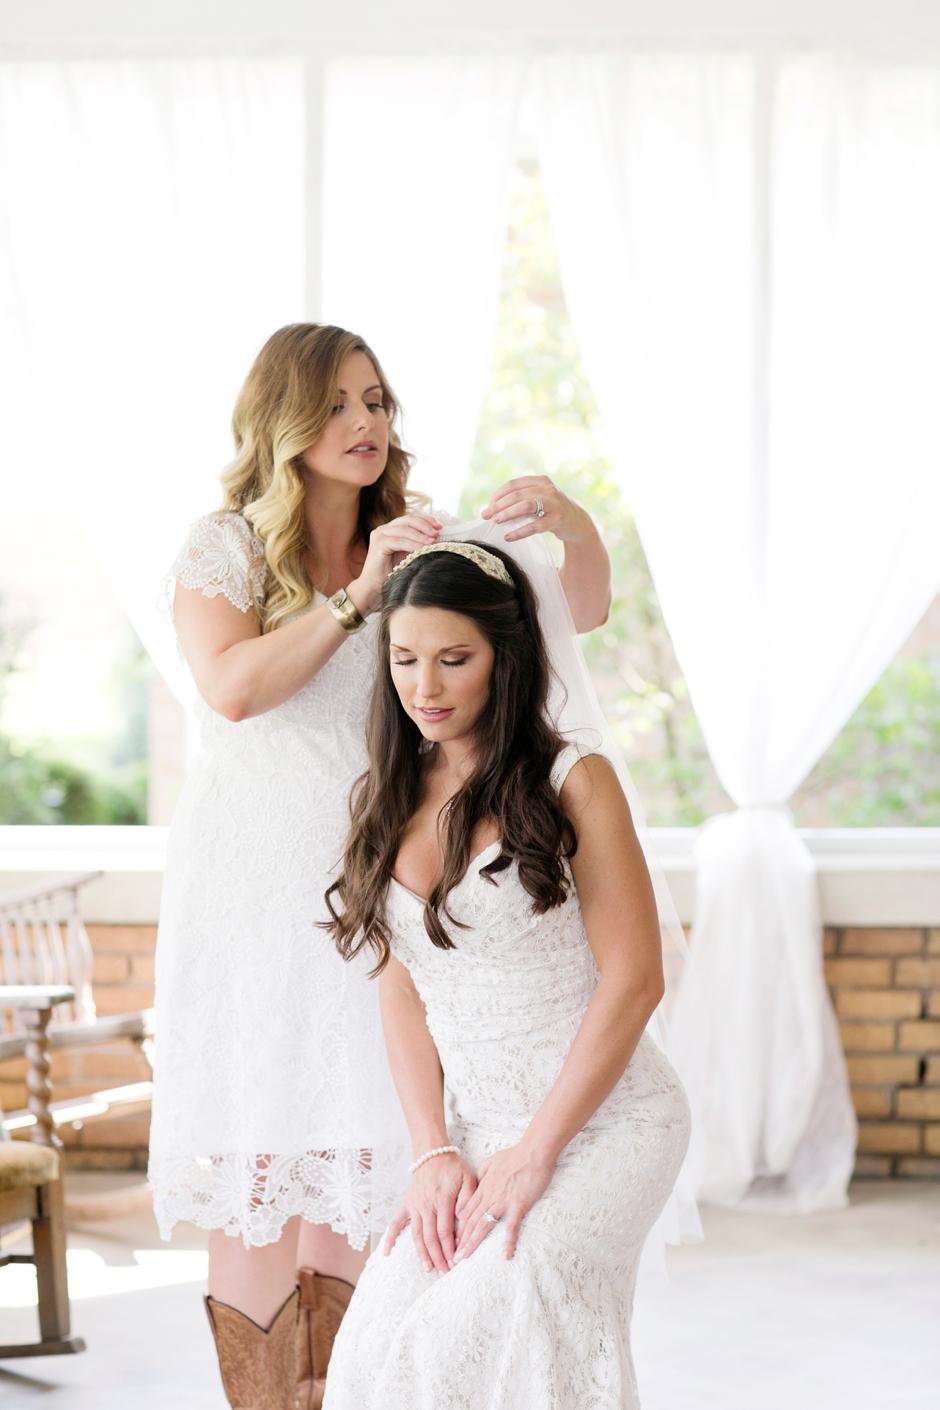 langley-farm-bourbon-wedding-spring-cream-bride-woodford-687